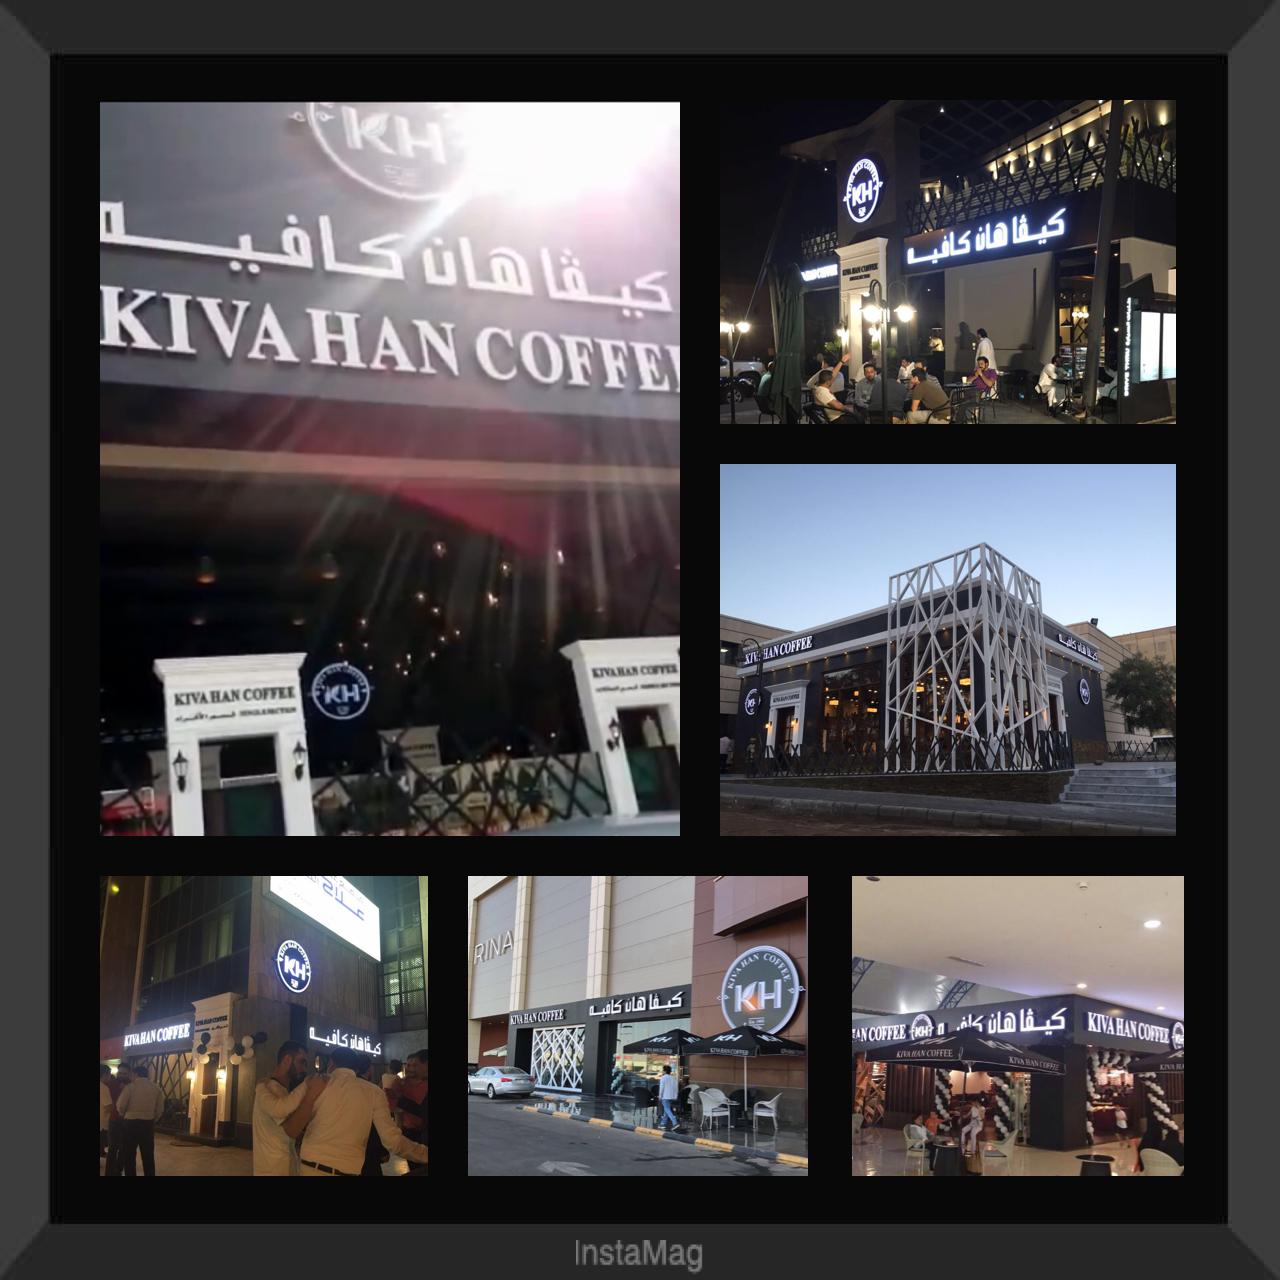 kiva-han-coffee-retail.jpg